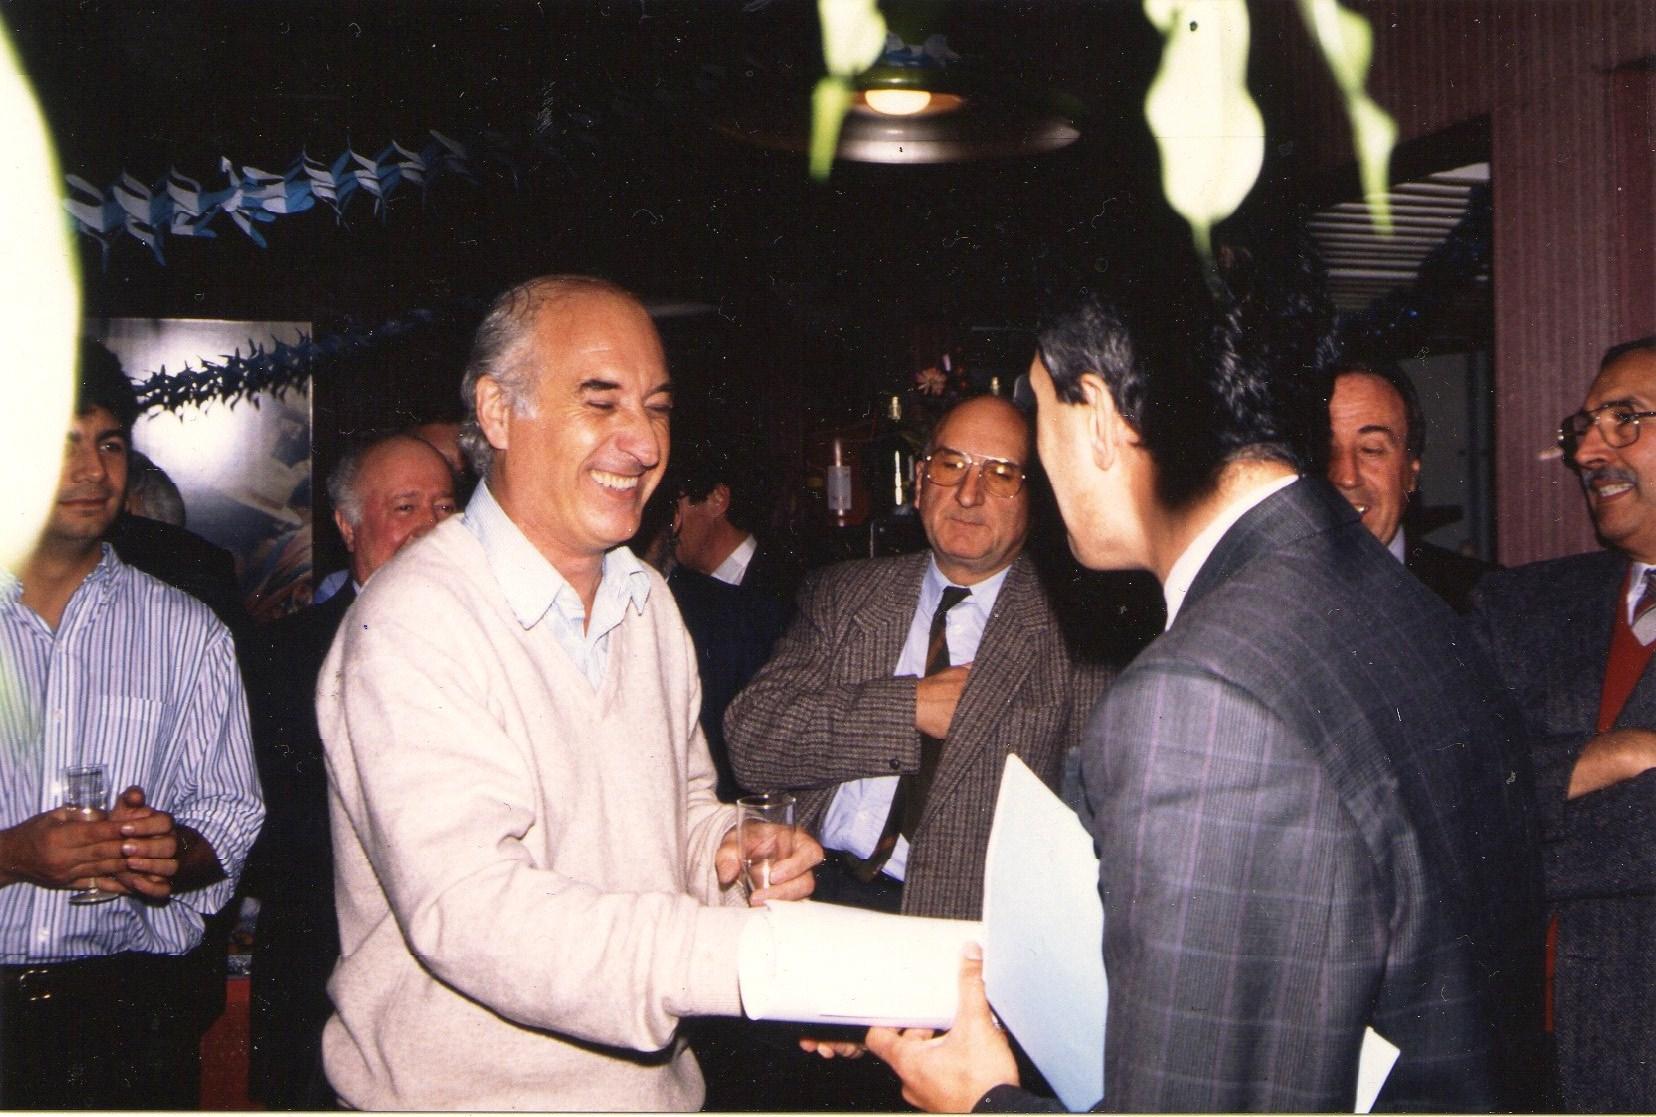 1989 medaille travail alain schrambach